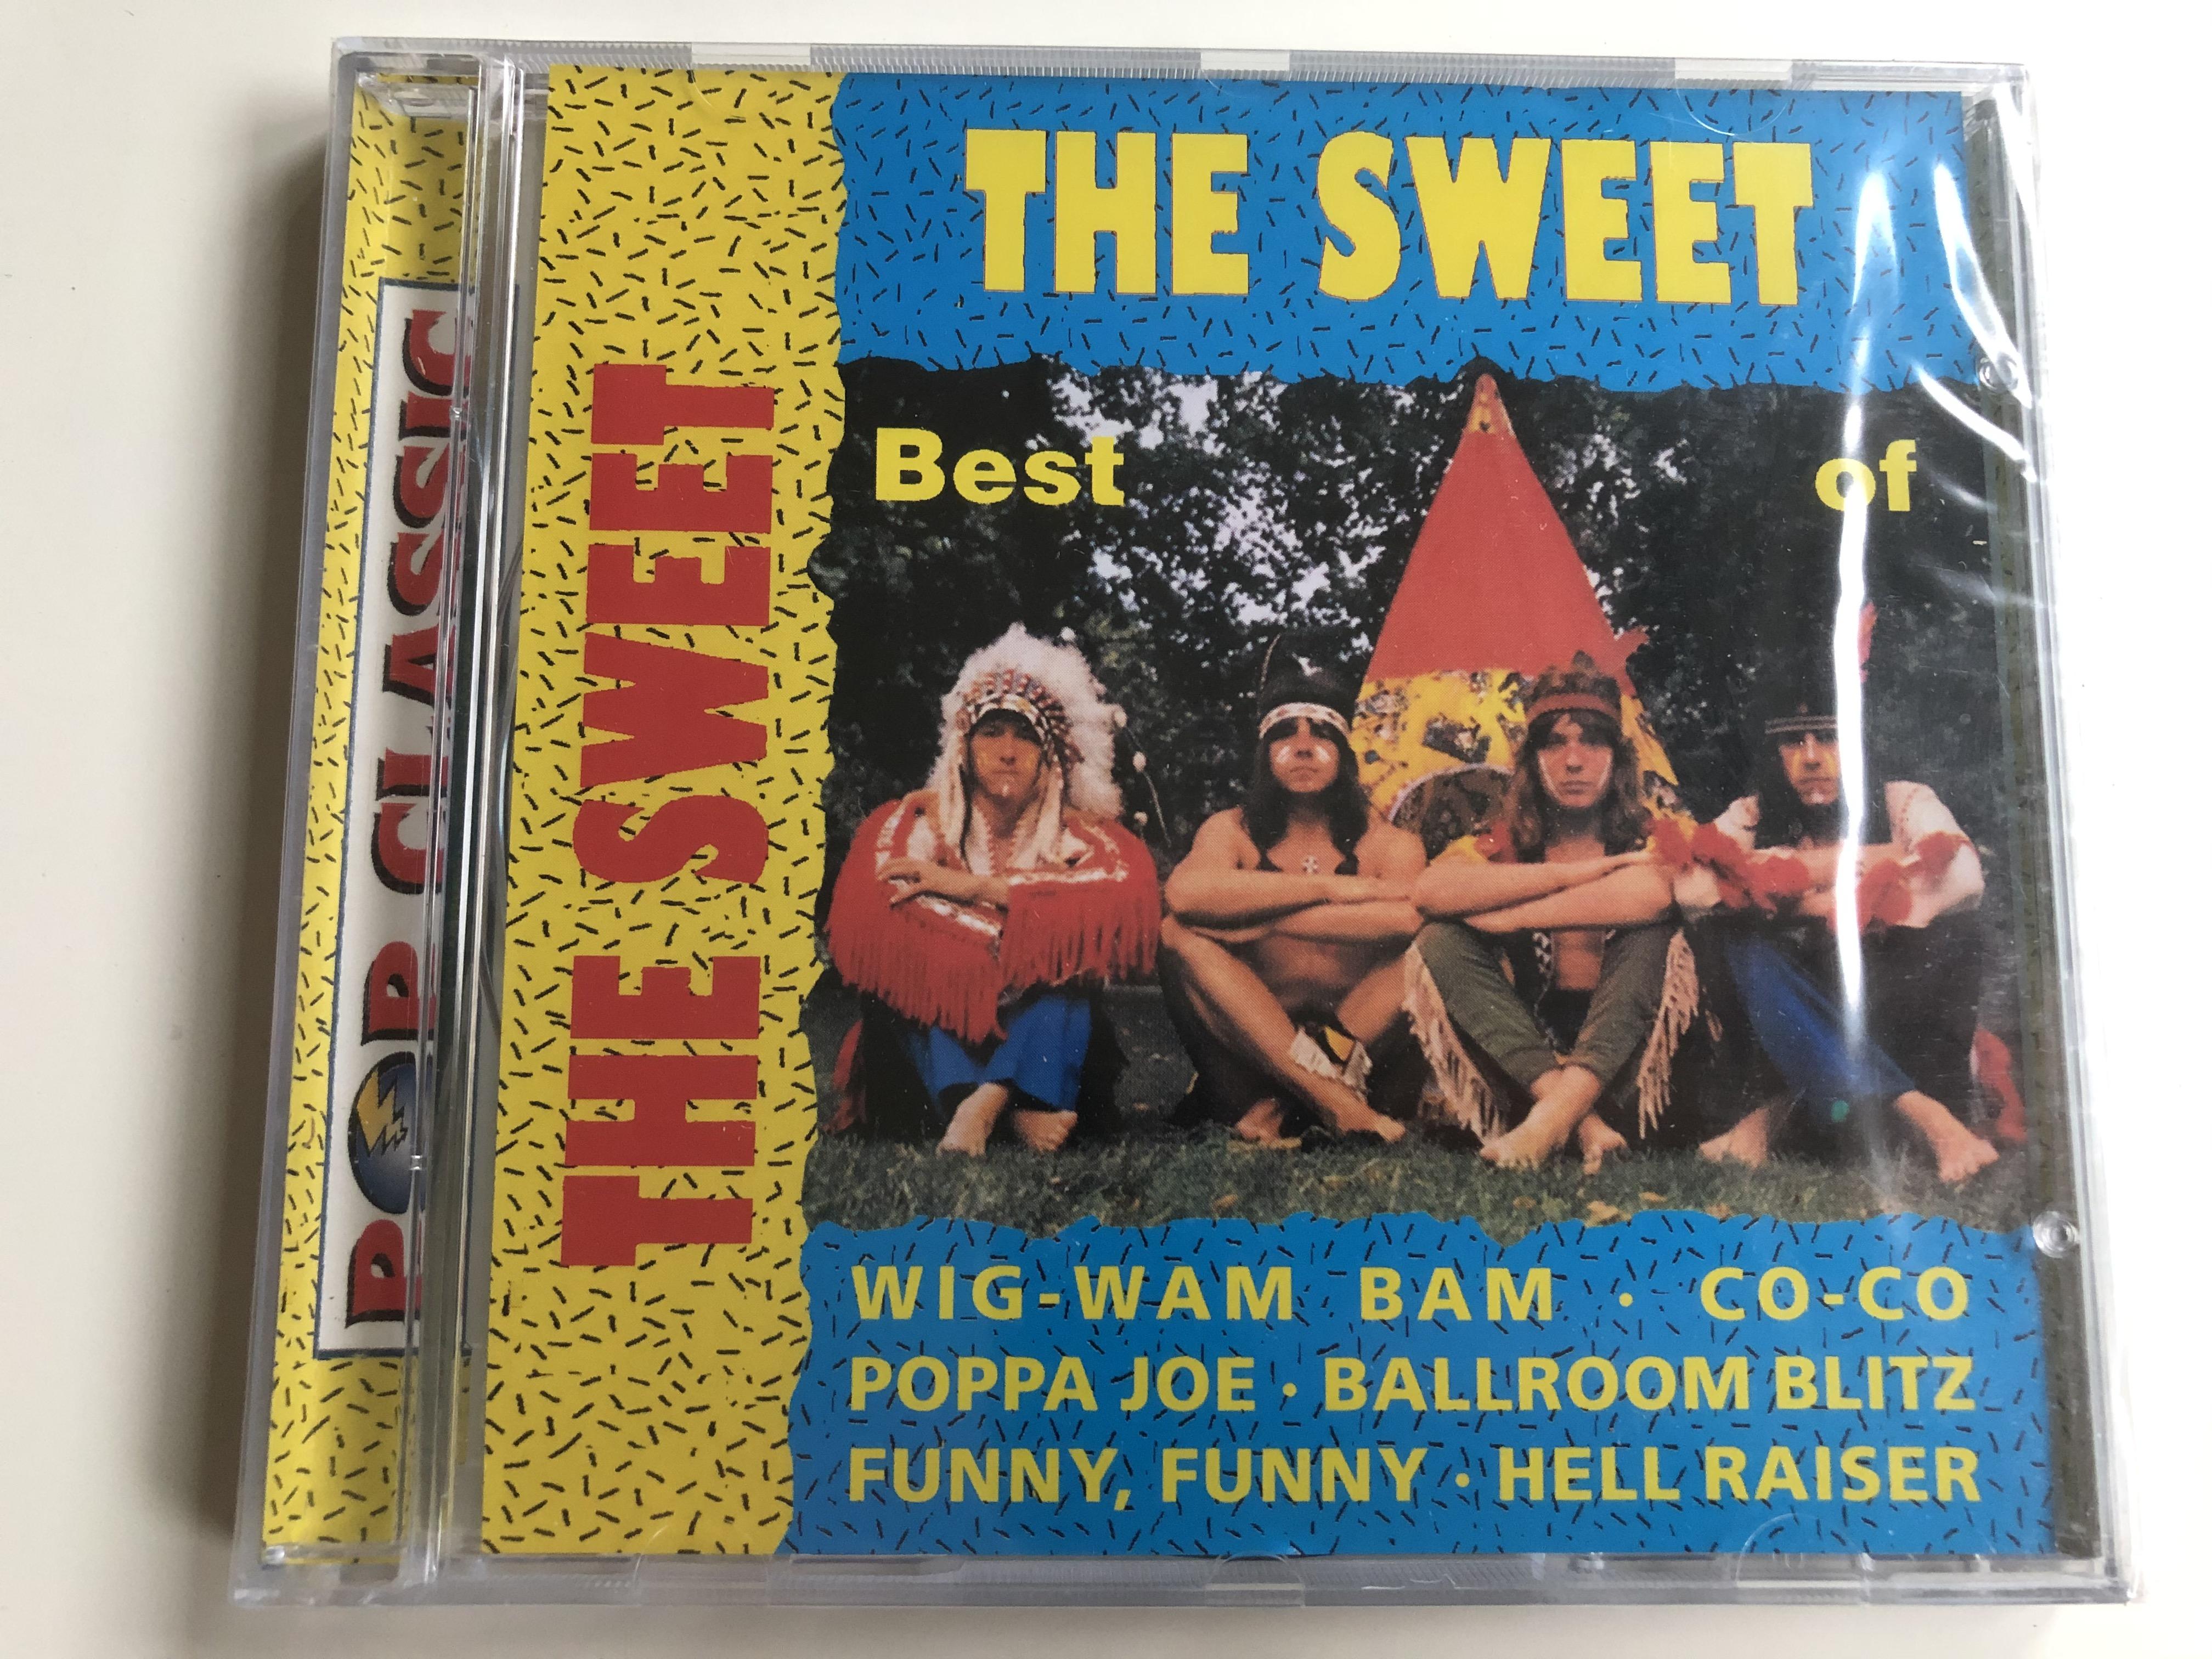 the-sweet-best-of-the-sweet-wig-wam-bam-co-co-poppa-joe-ballroom-blitz-funny-funny-hell-raiser-pop-classic-euroton-audio-cd-eucd-0009-1-.jpg